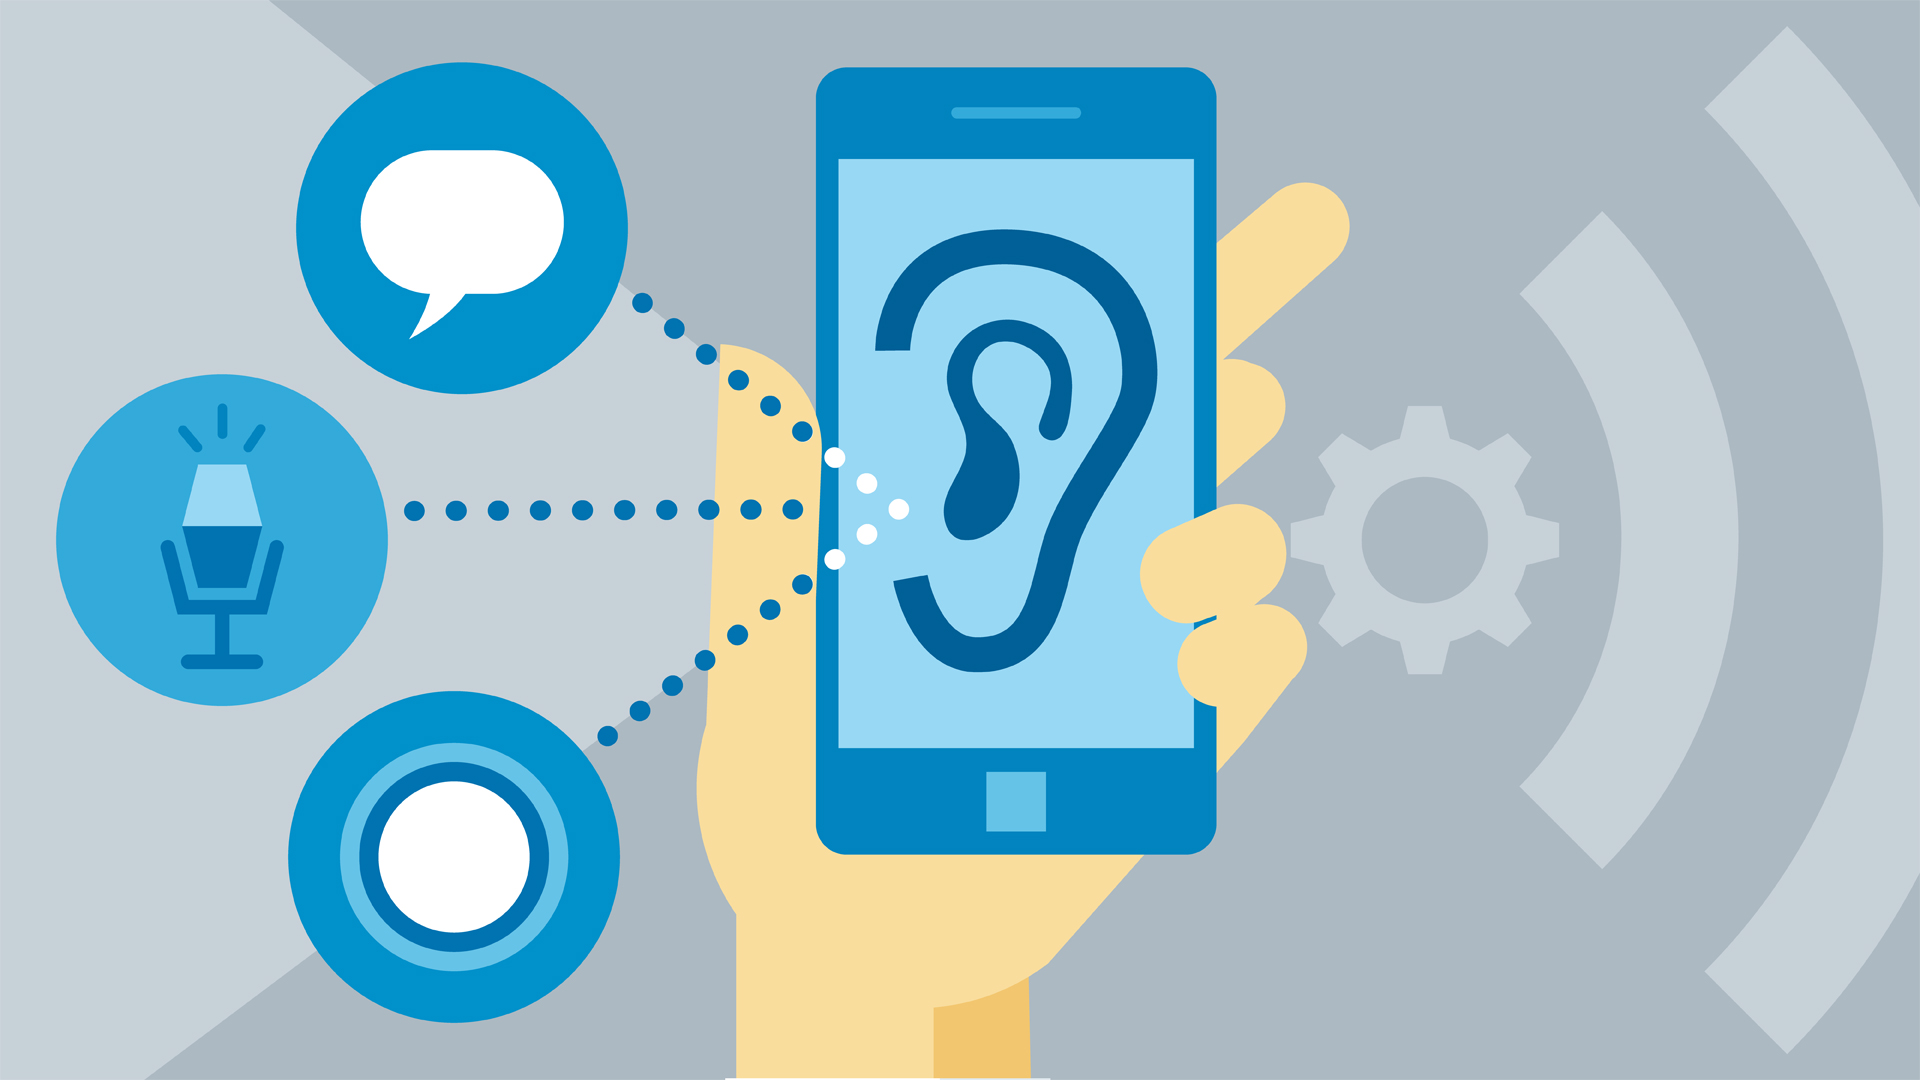 Developing UWP Apps: 10 Voice, Speech, and Cortana